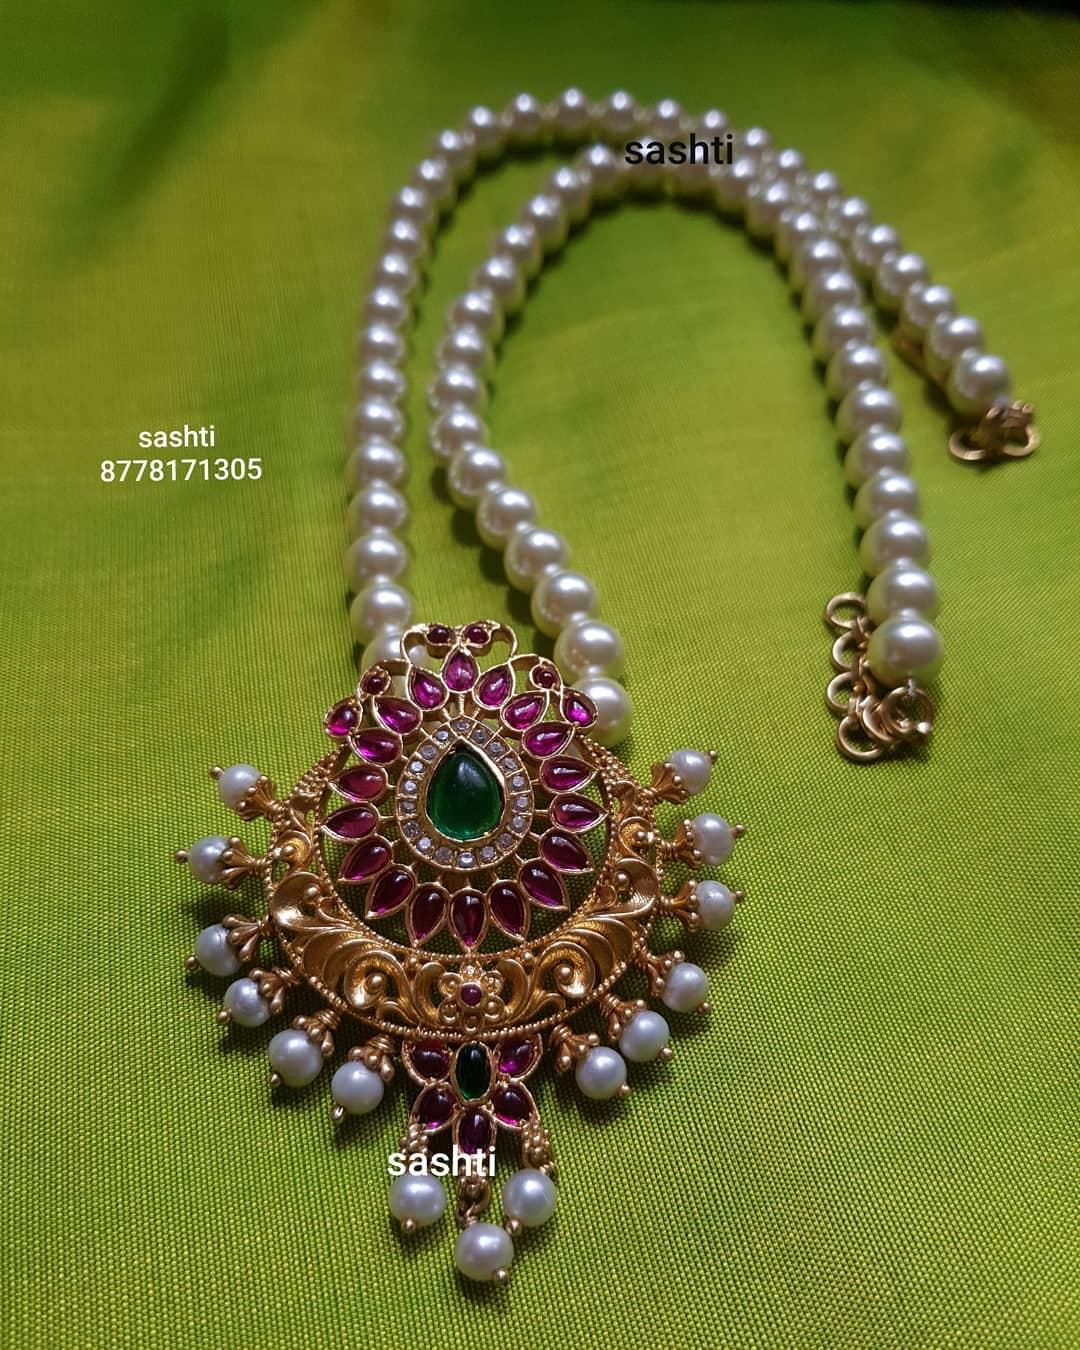 kemp-pendant-pearl-necklace